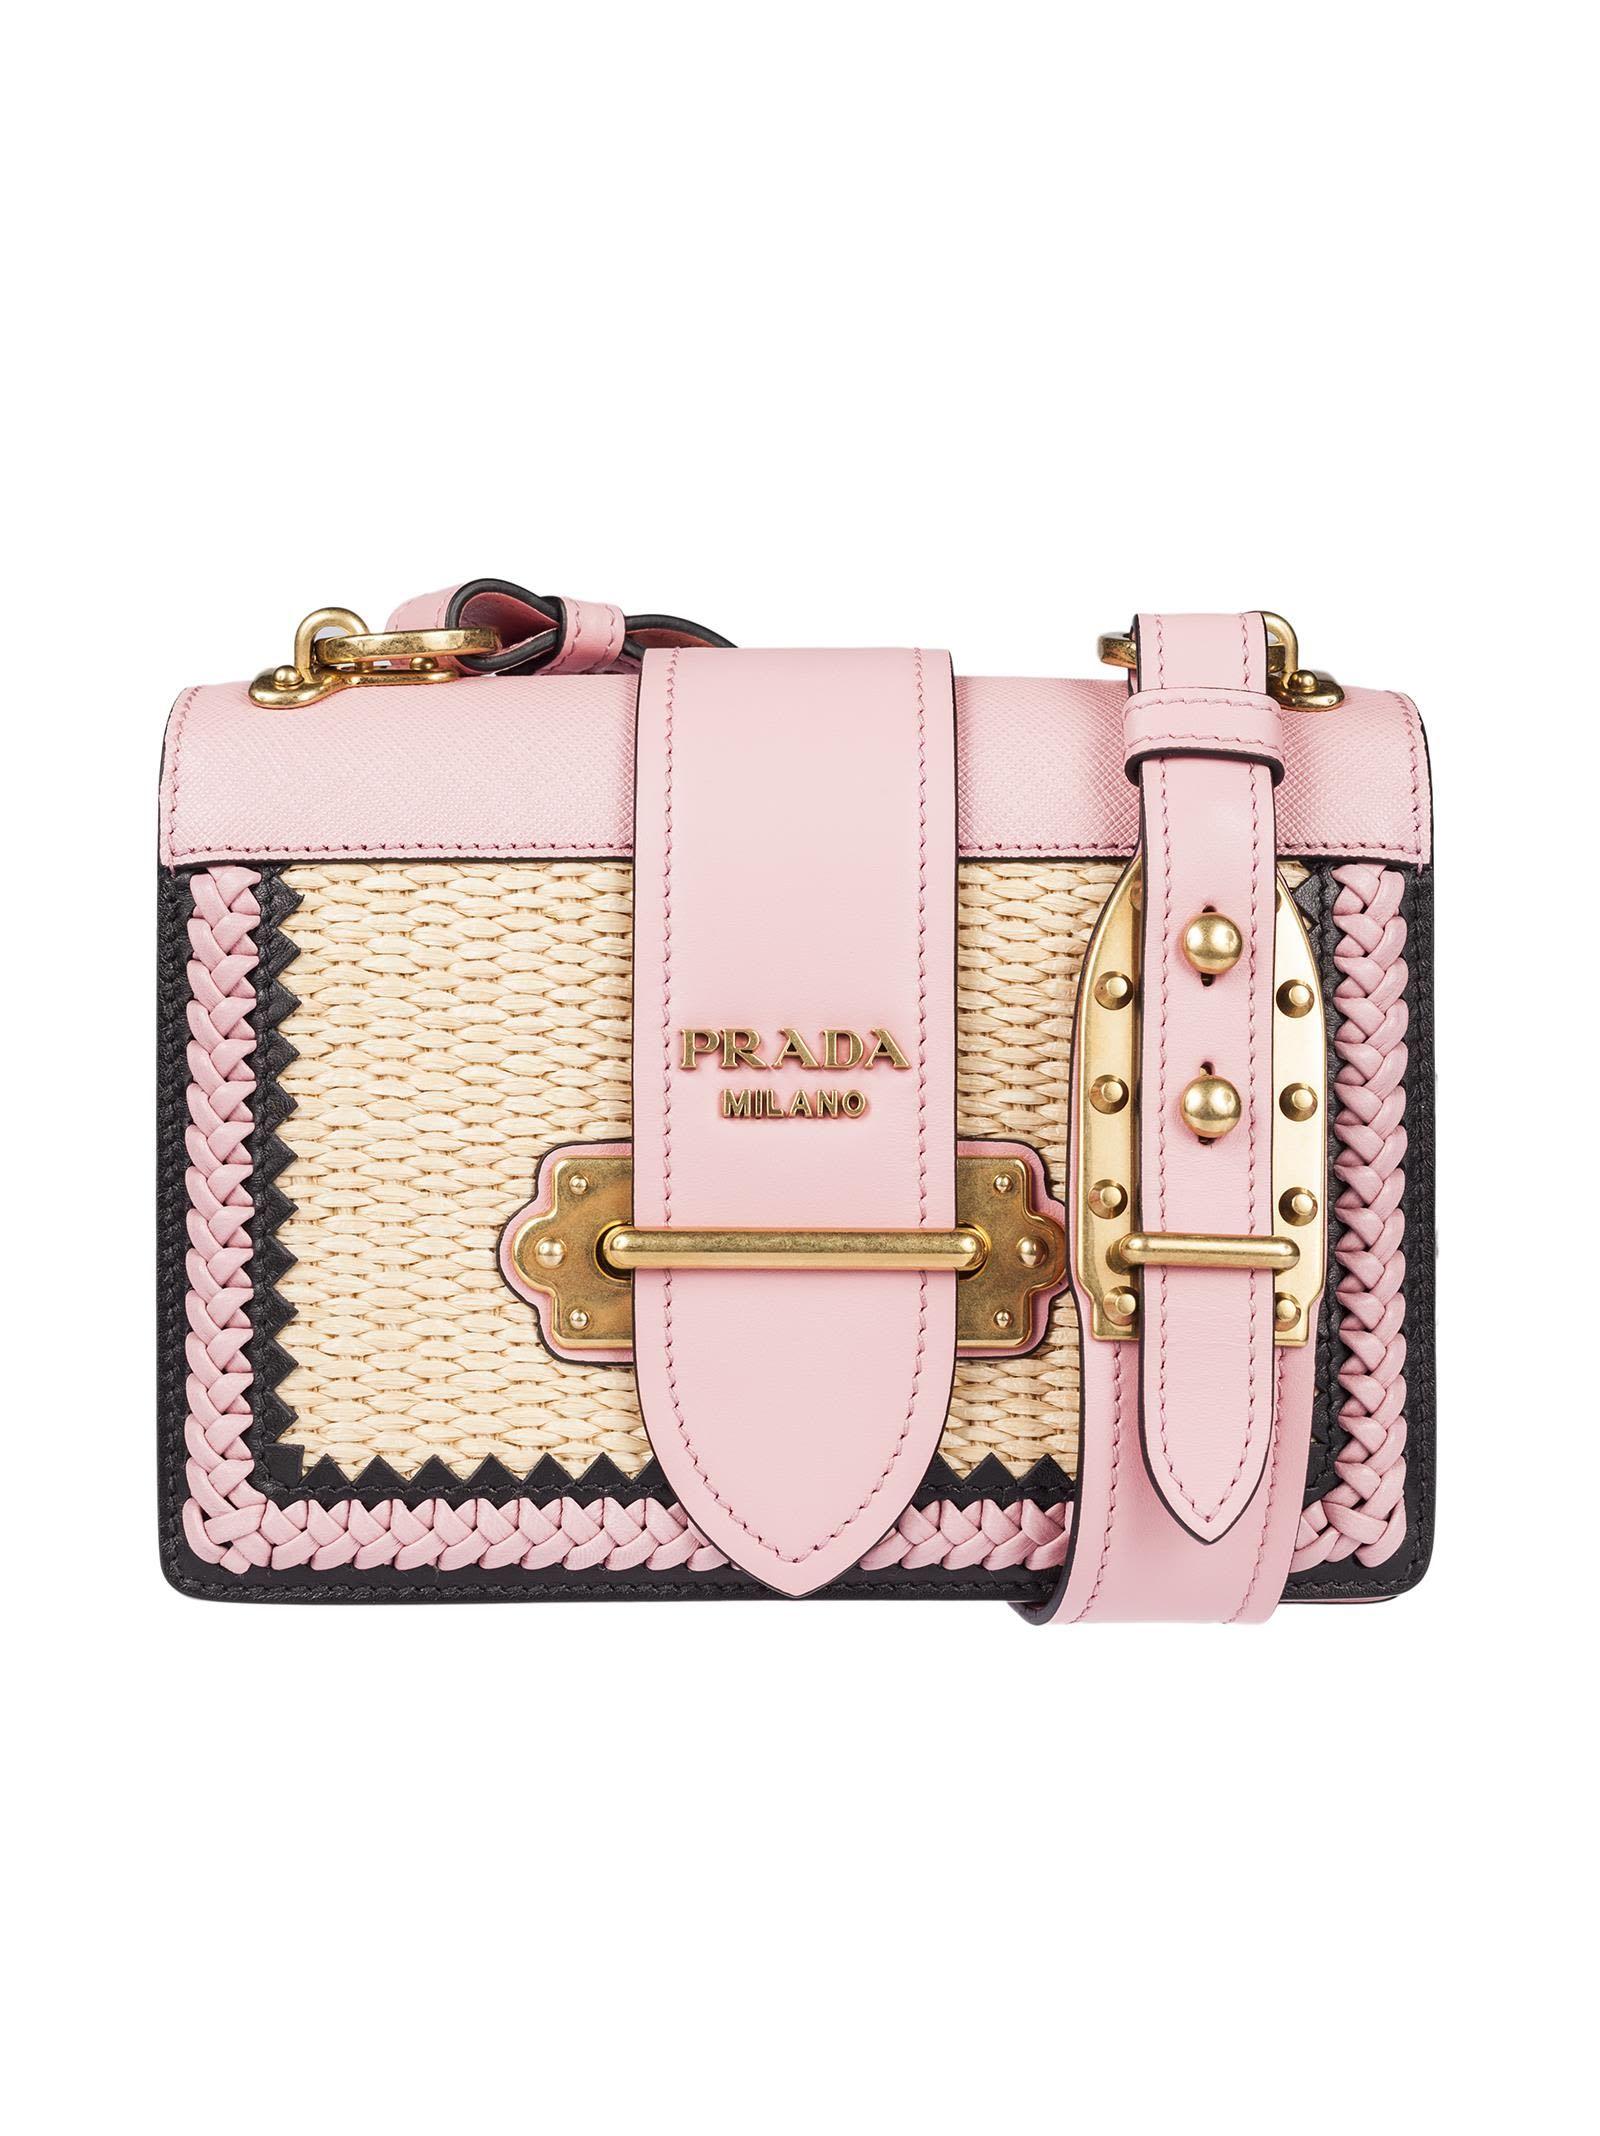 905a51d5bd PRADA CAHIER STRAW SHOULDER BAG.  prada  bags  shoulder bags